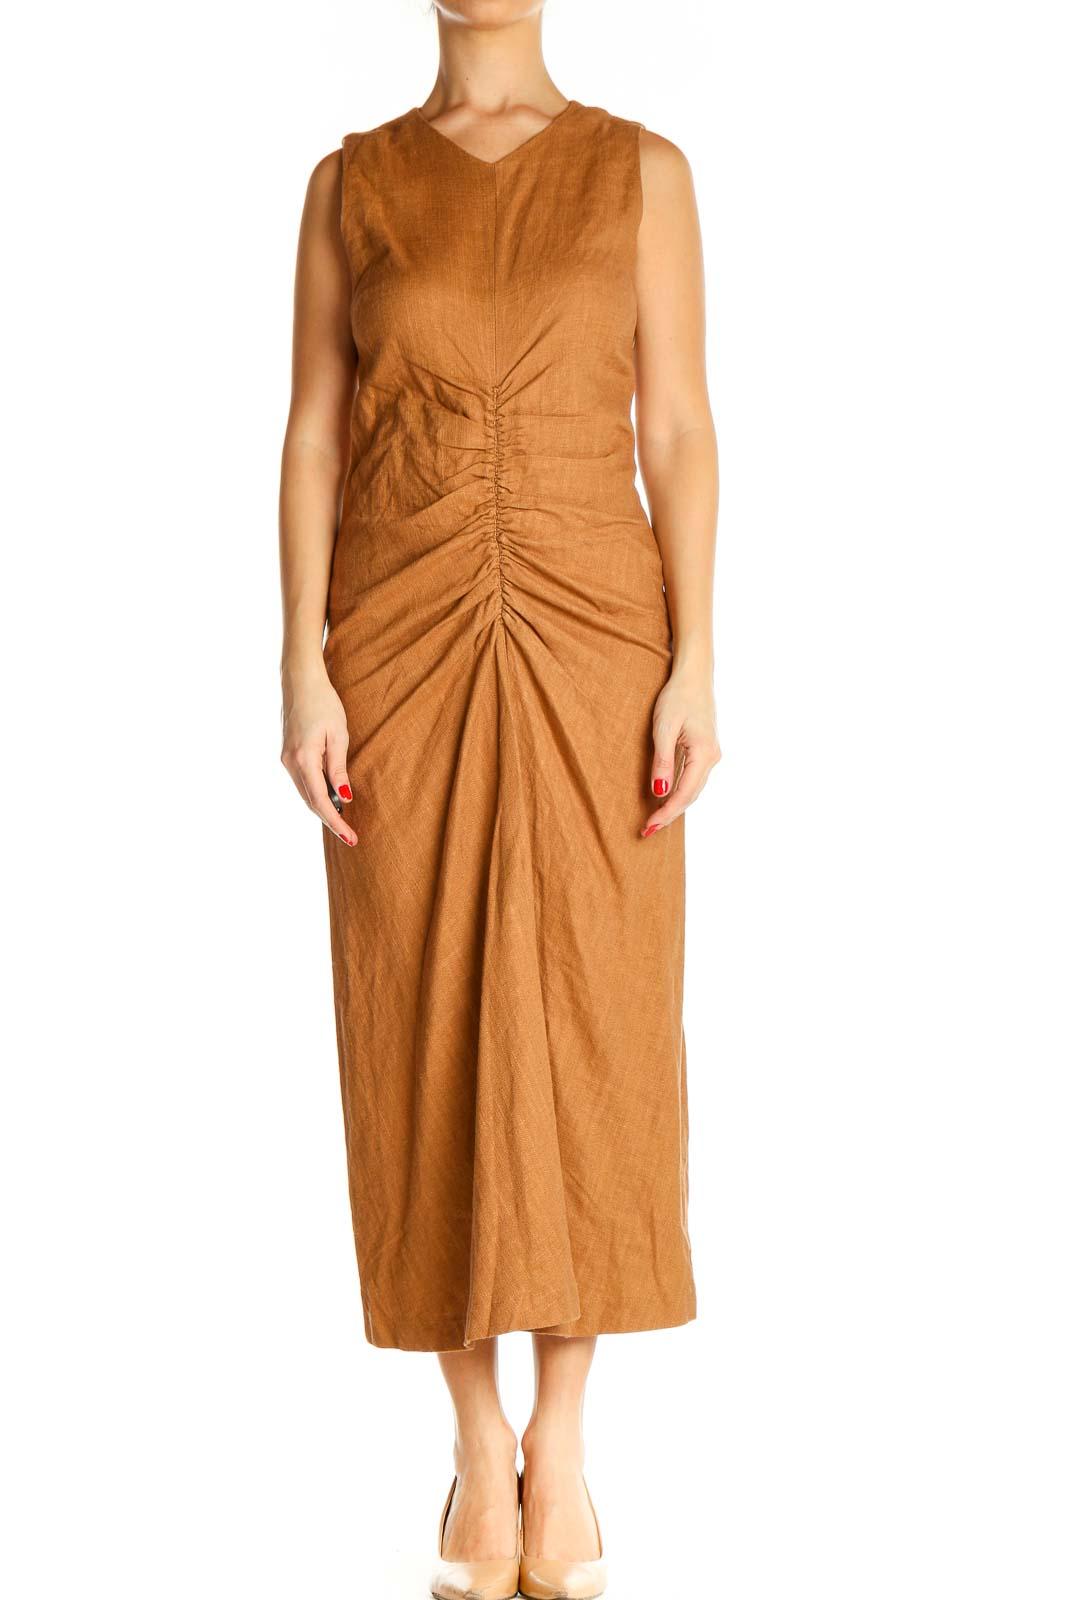 Orange Solid Classic Column Dress Front